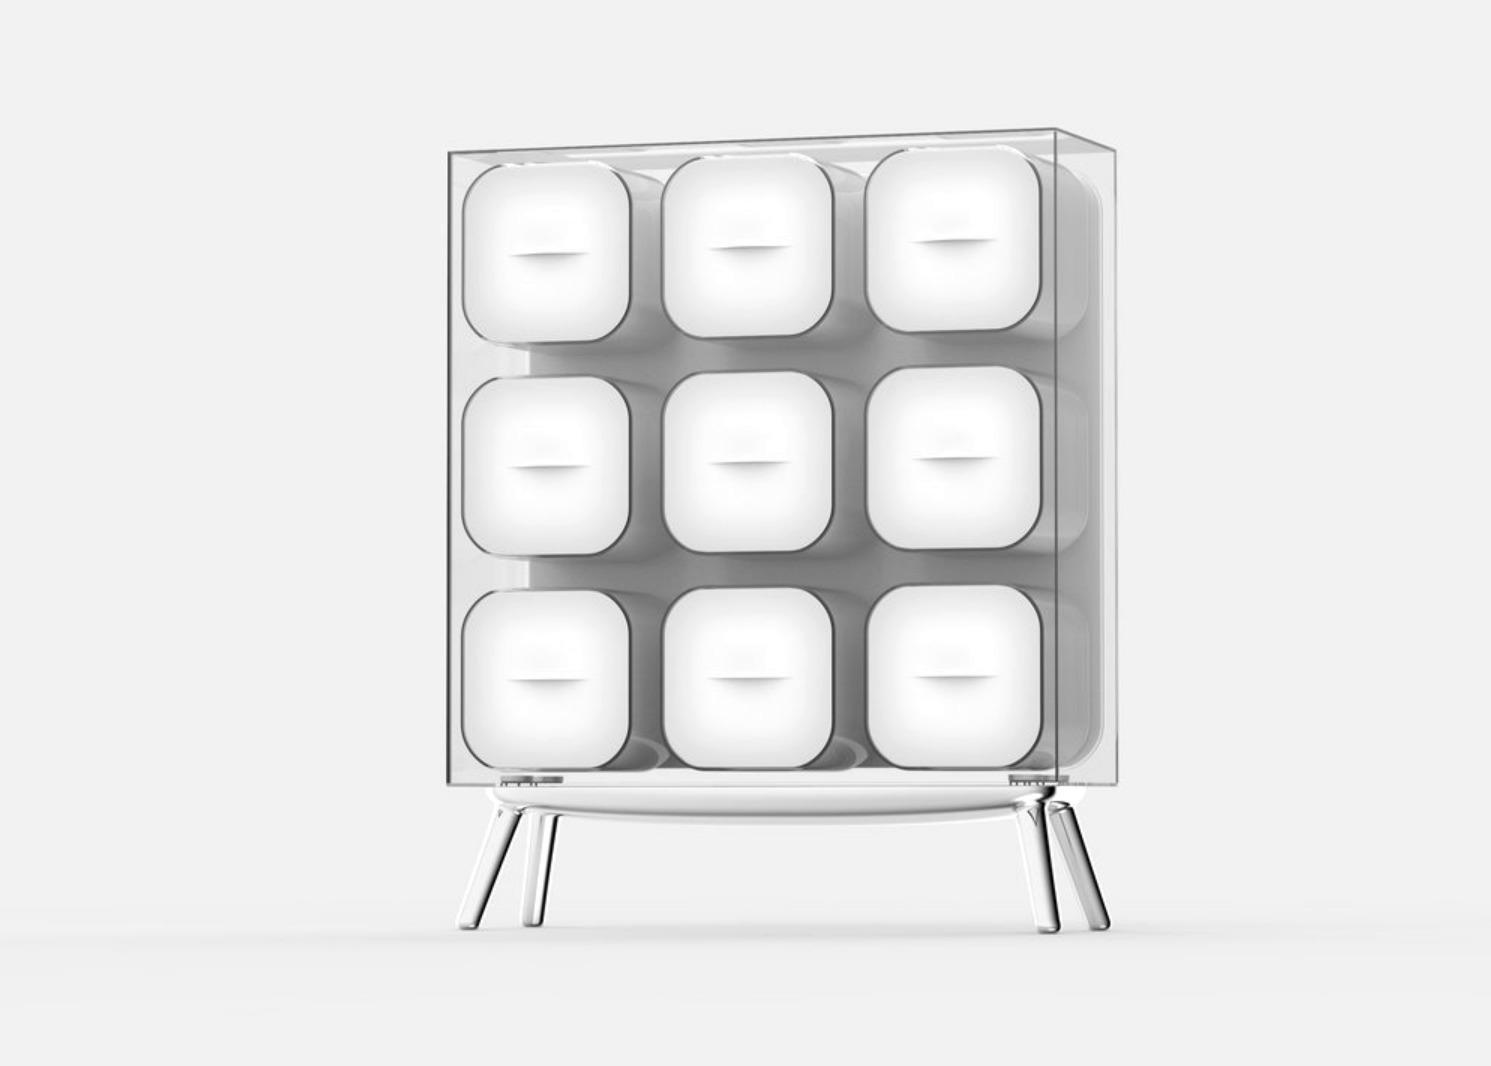 Design: Hyunsol Park hyunsolpar - minimalist | ello